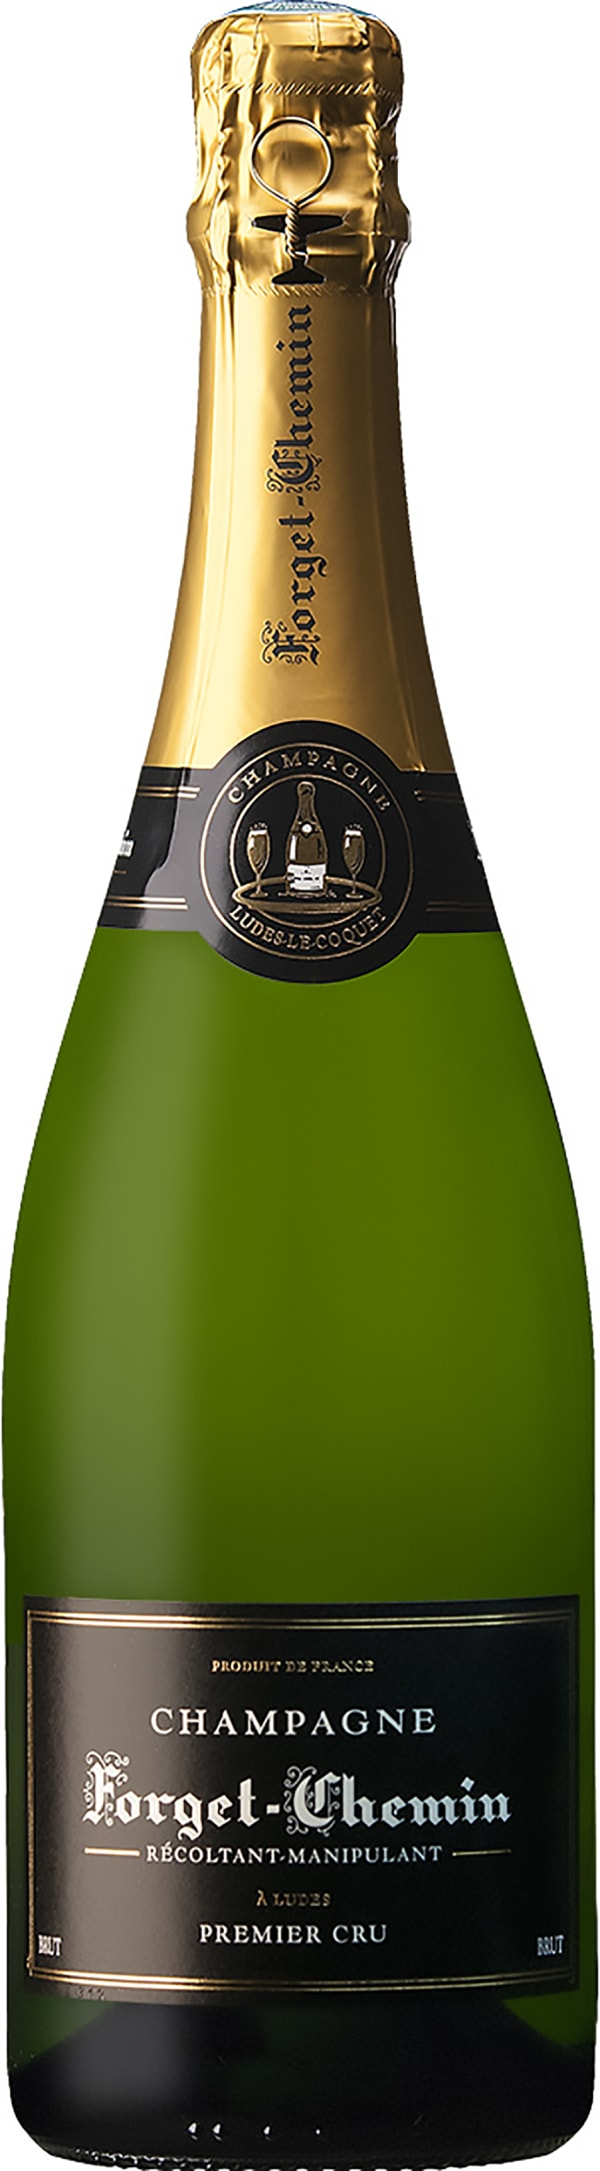 Forget-Chemin Premier Cru Champagne Brut